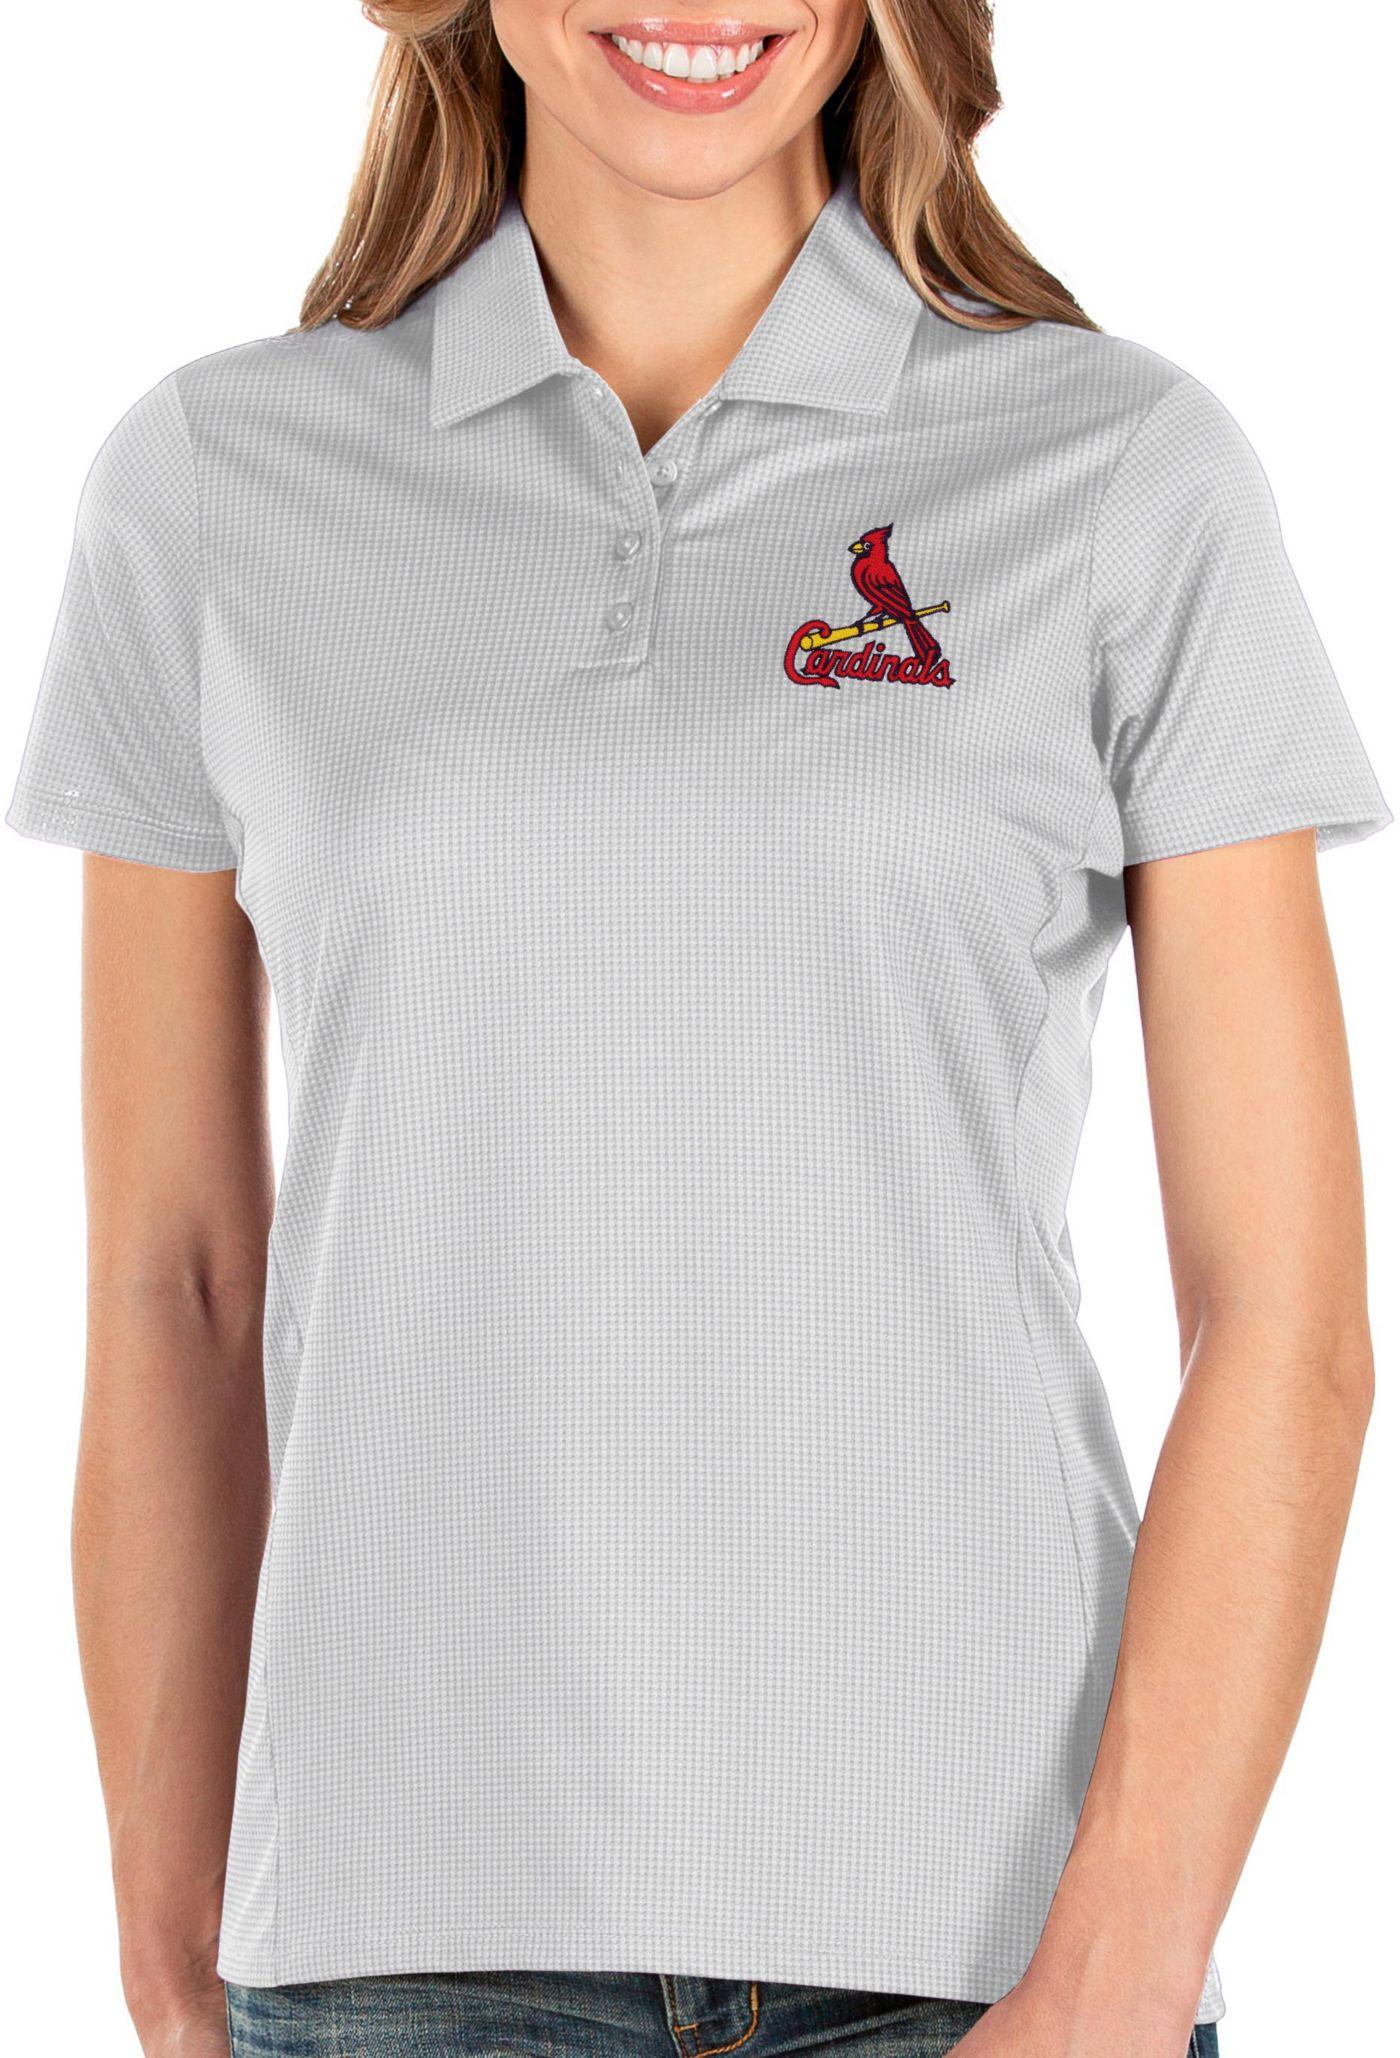 Antigua Women's St. Louis Cardinals White Balance Polo